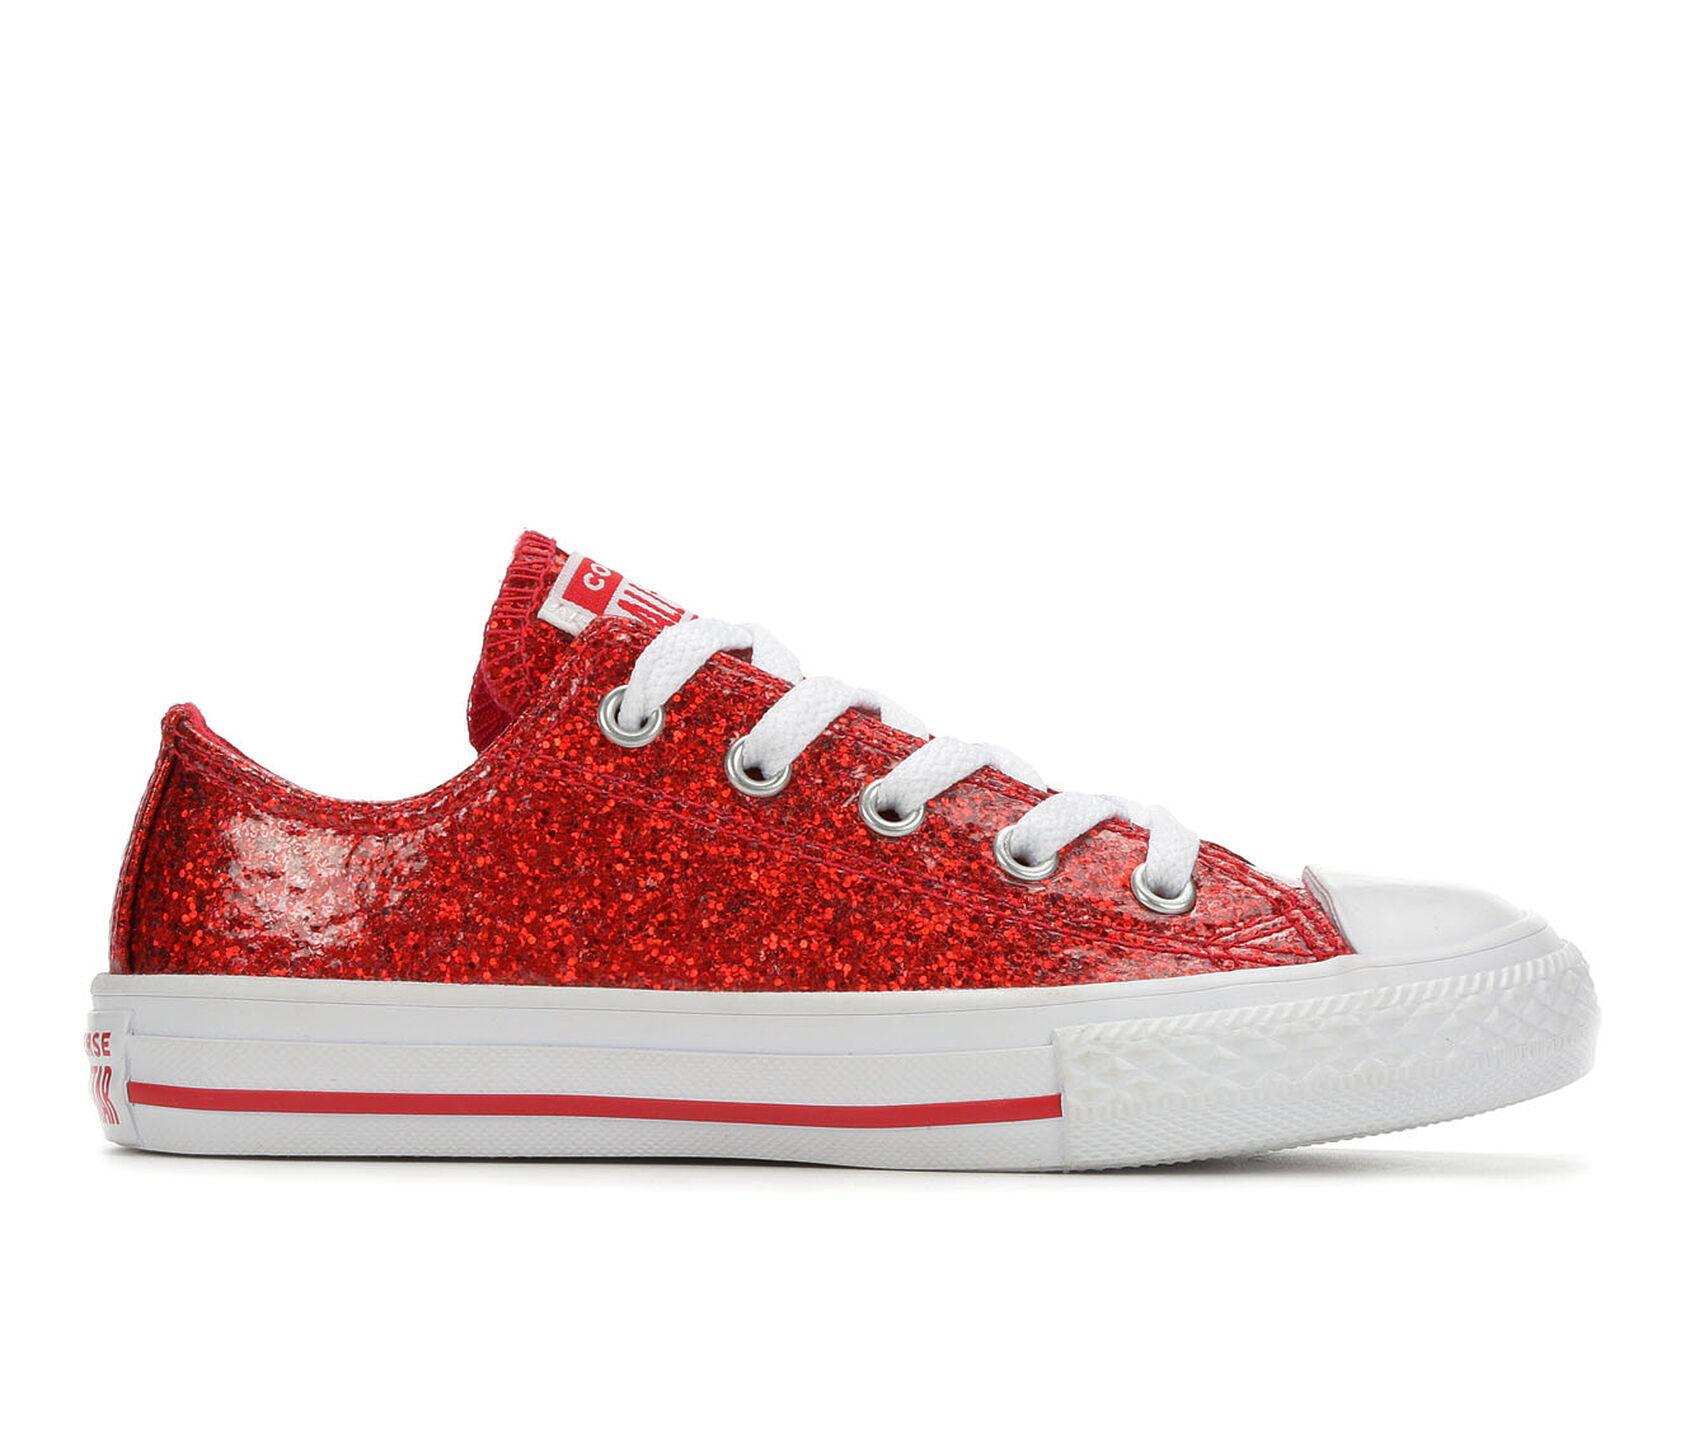 Girls  Converse Little Kid   Big Kid CTAS Party Dress Sneakers ... 15dbfbfc4